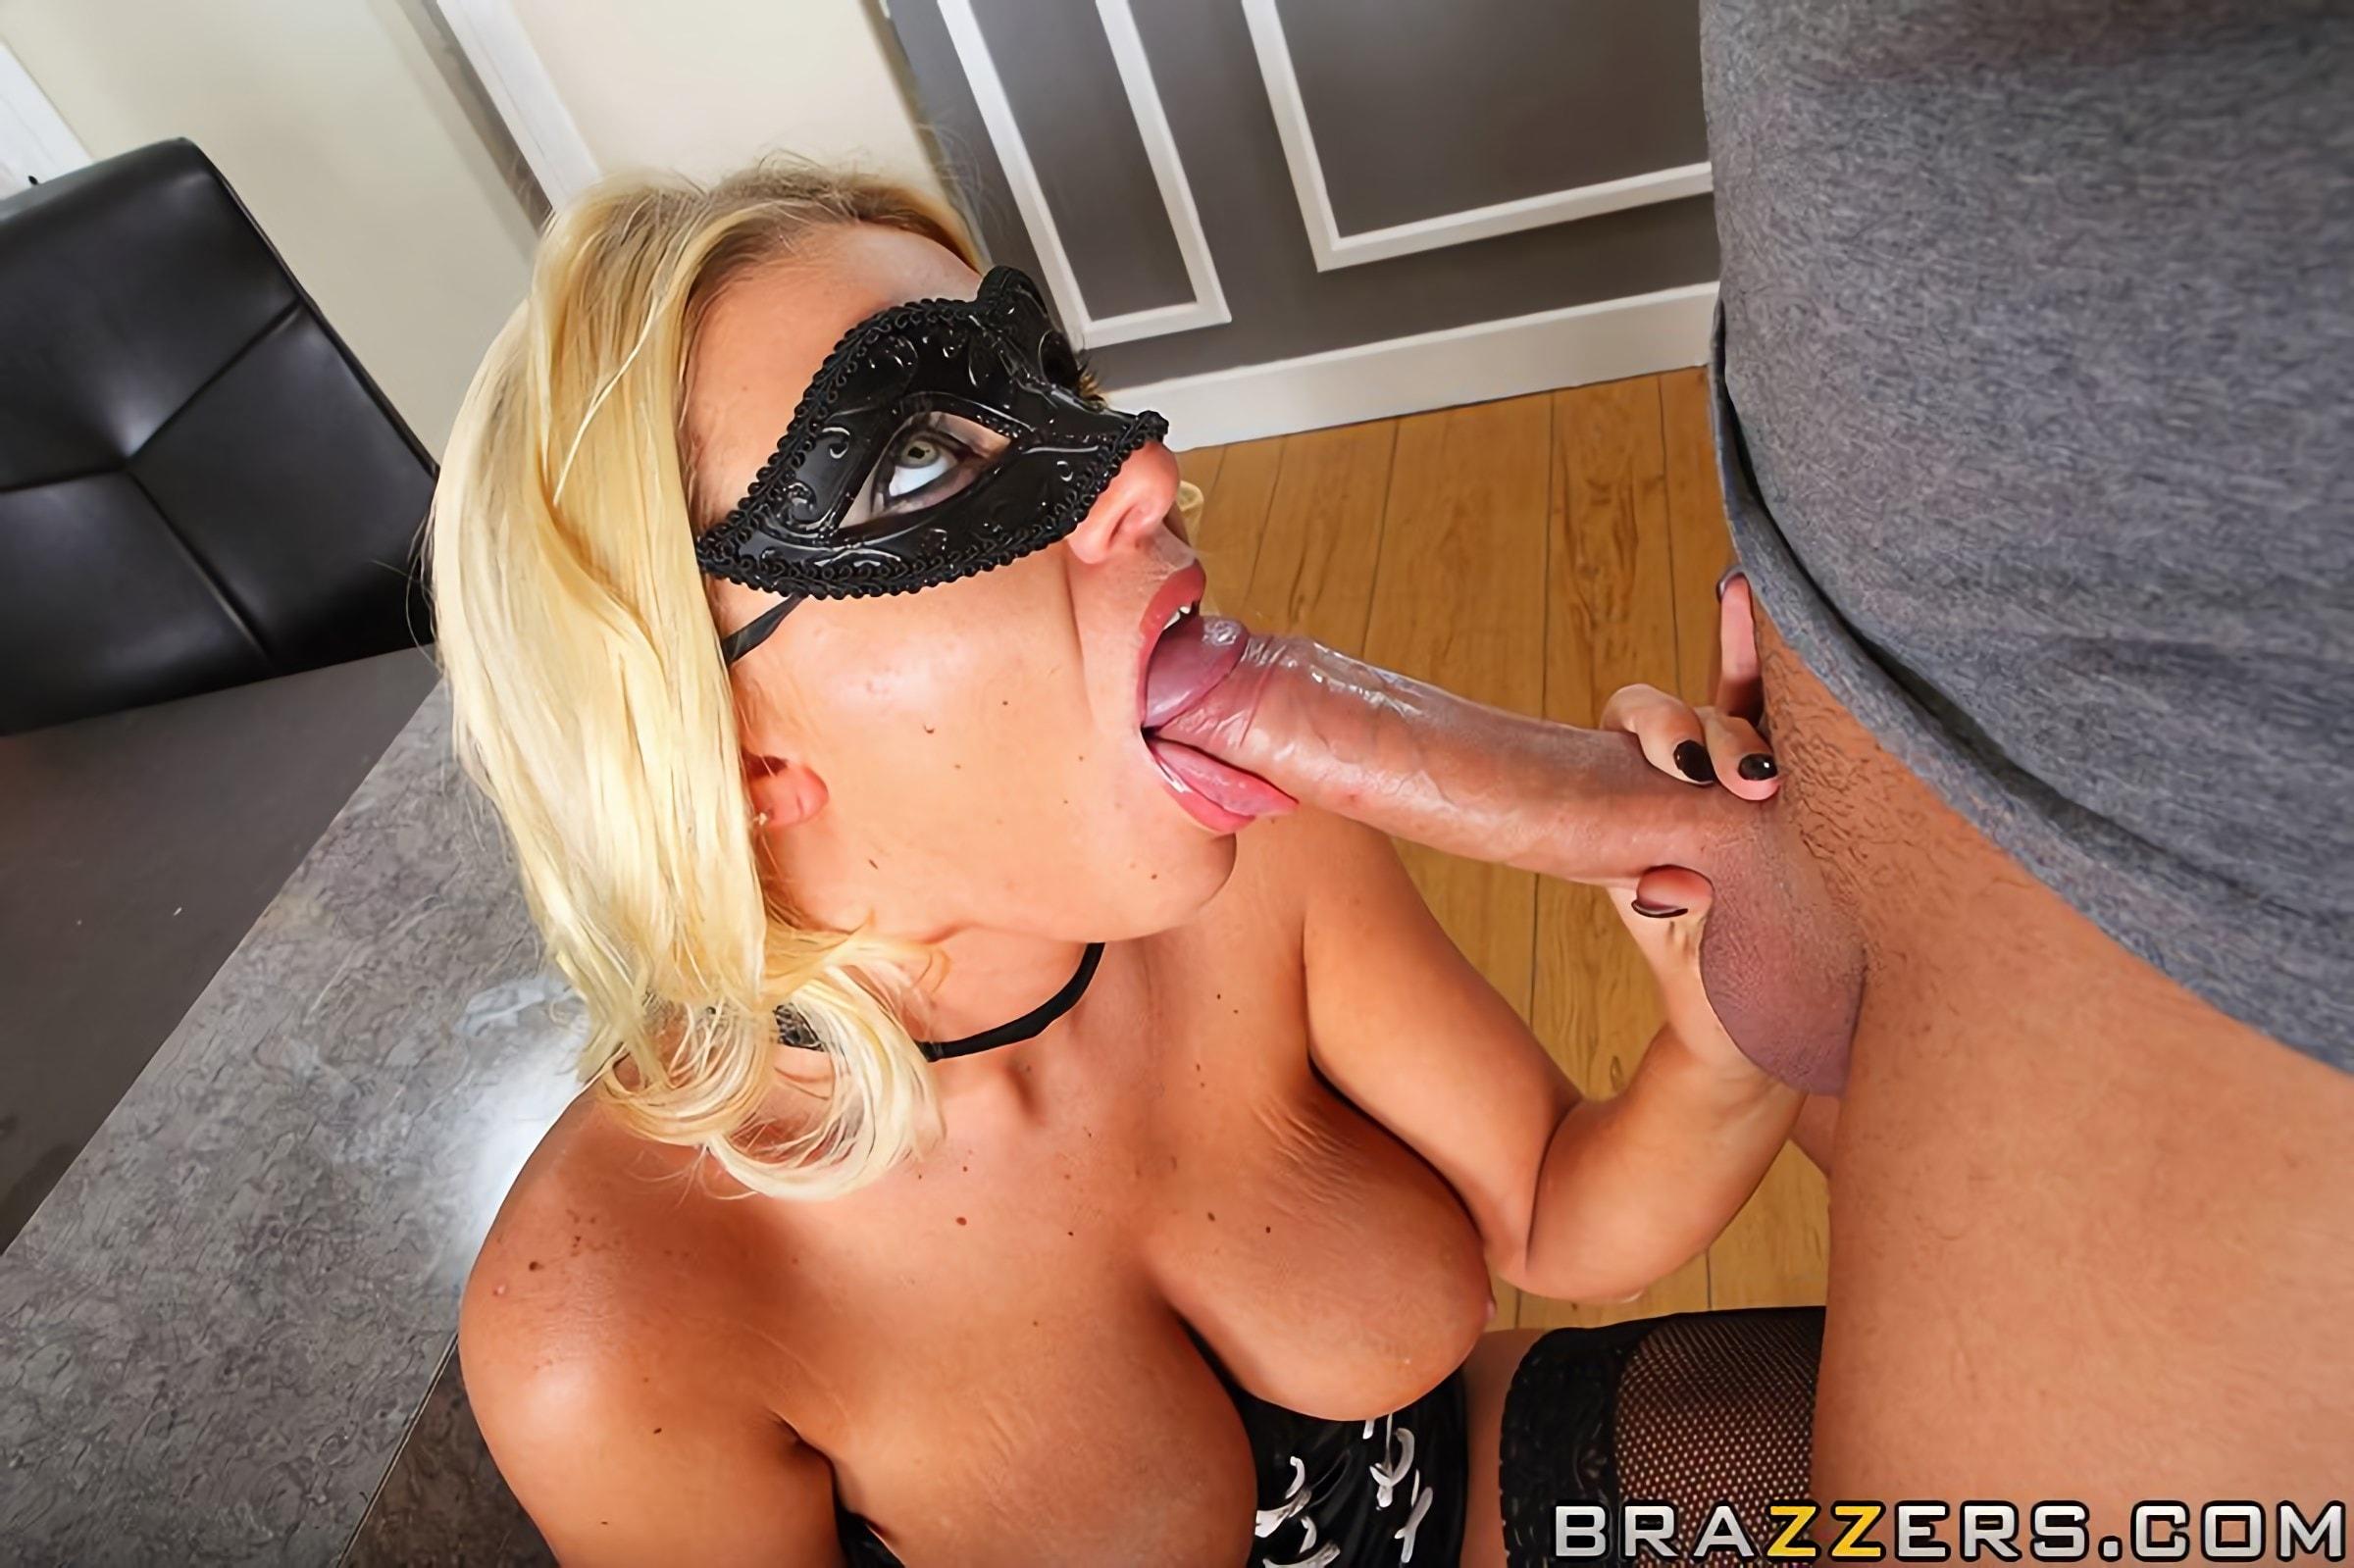 live-brazzer-deep-throat-avatar-porn-sex